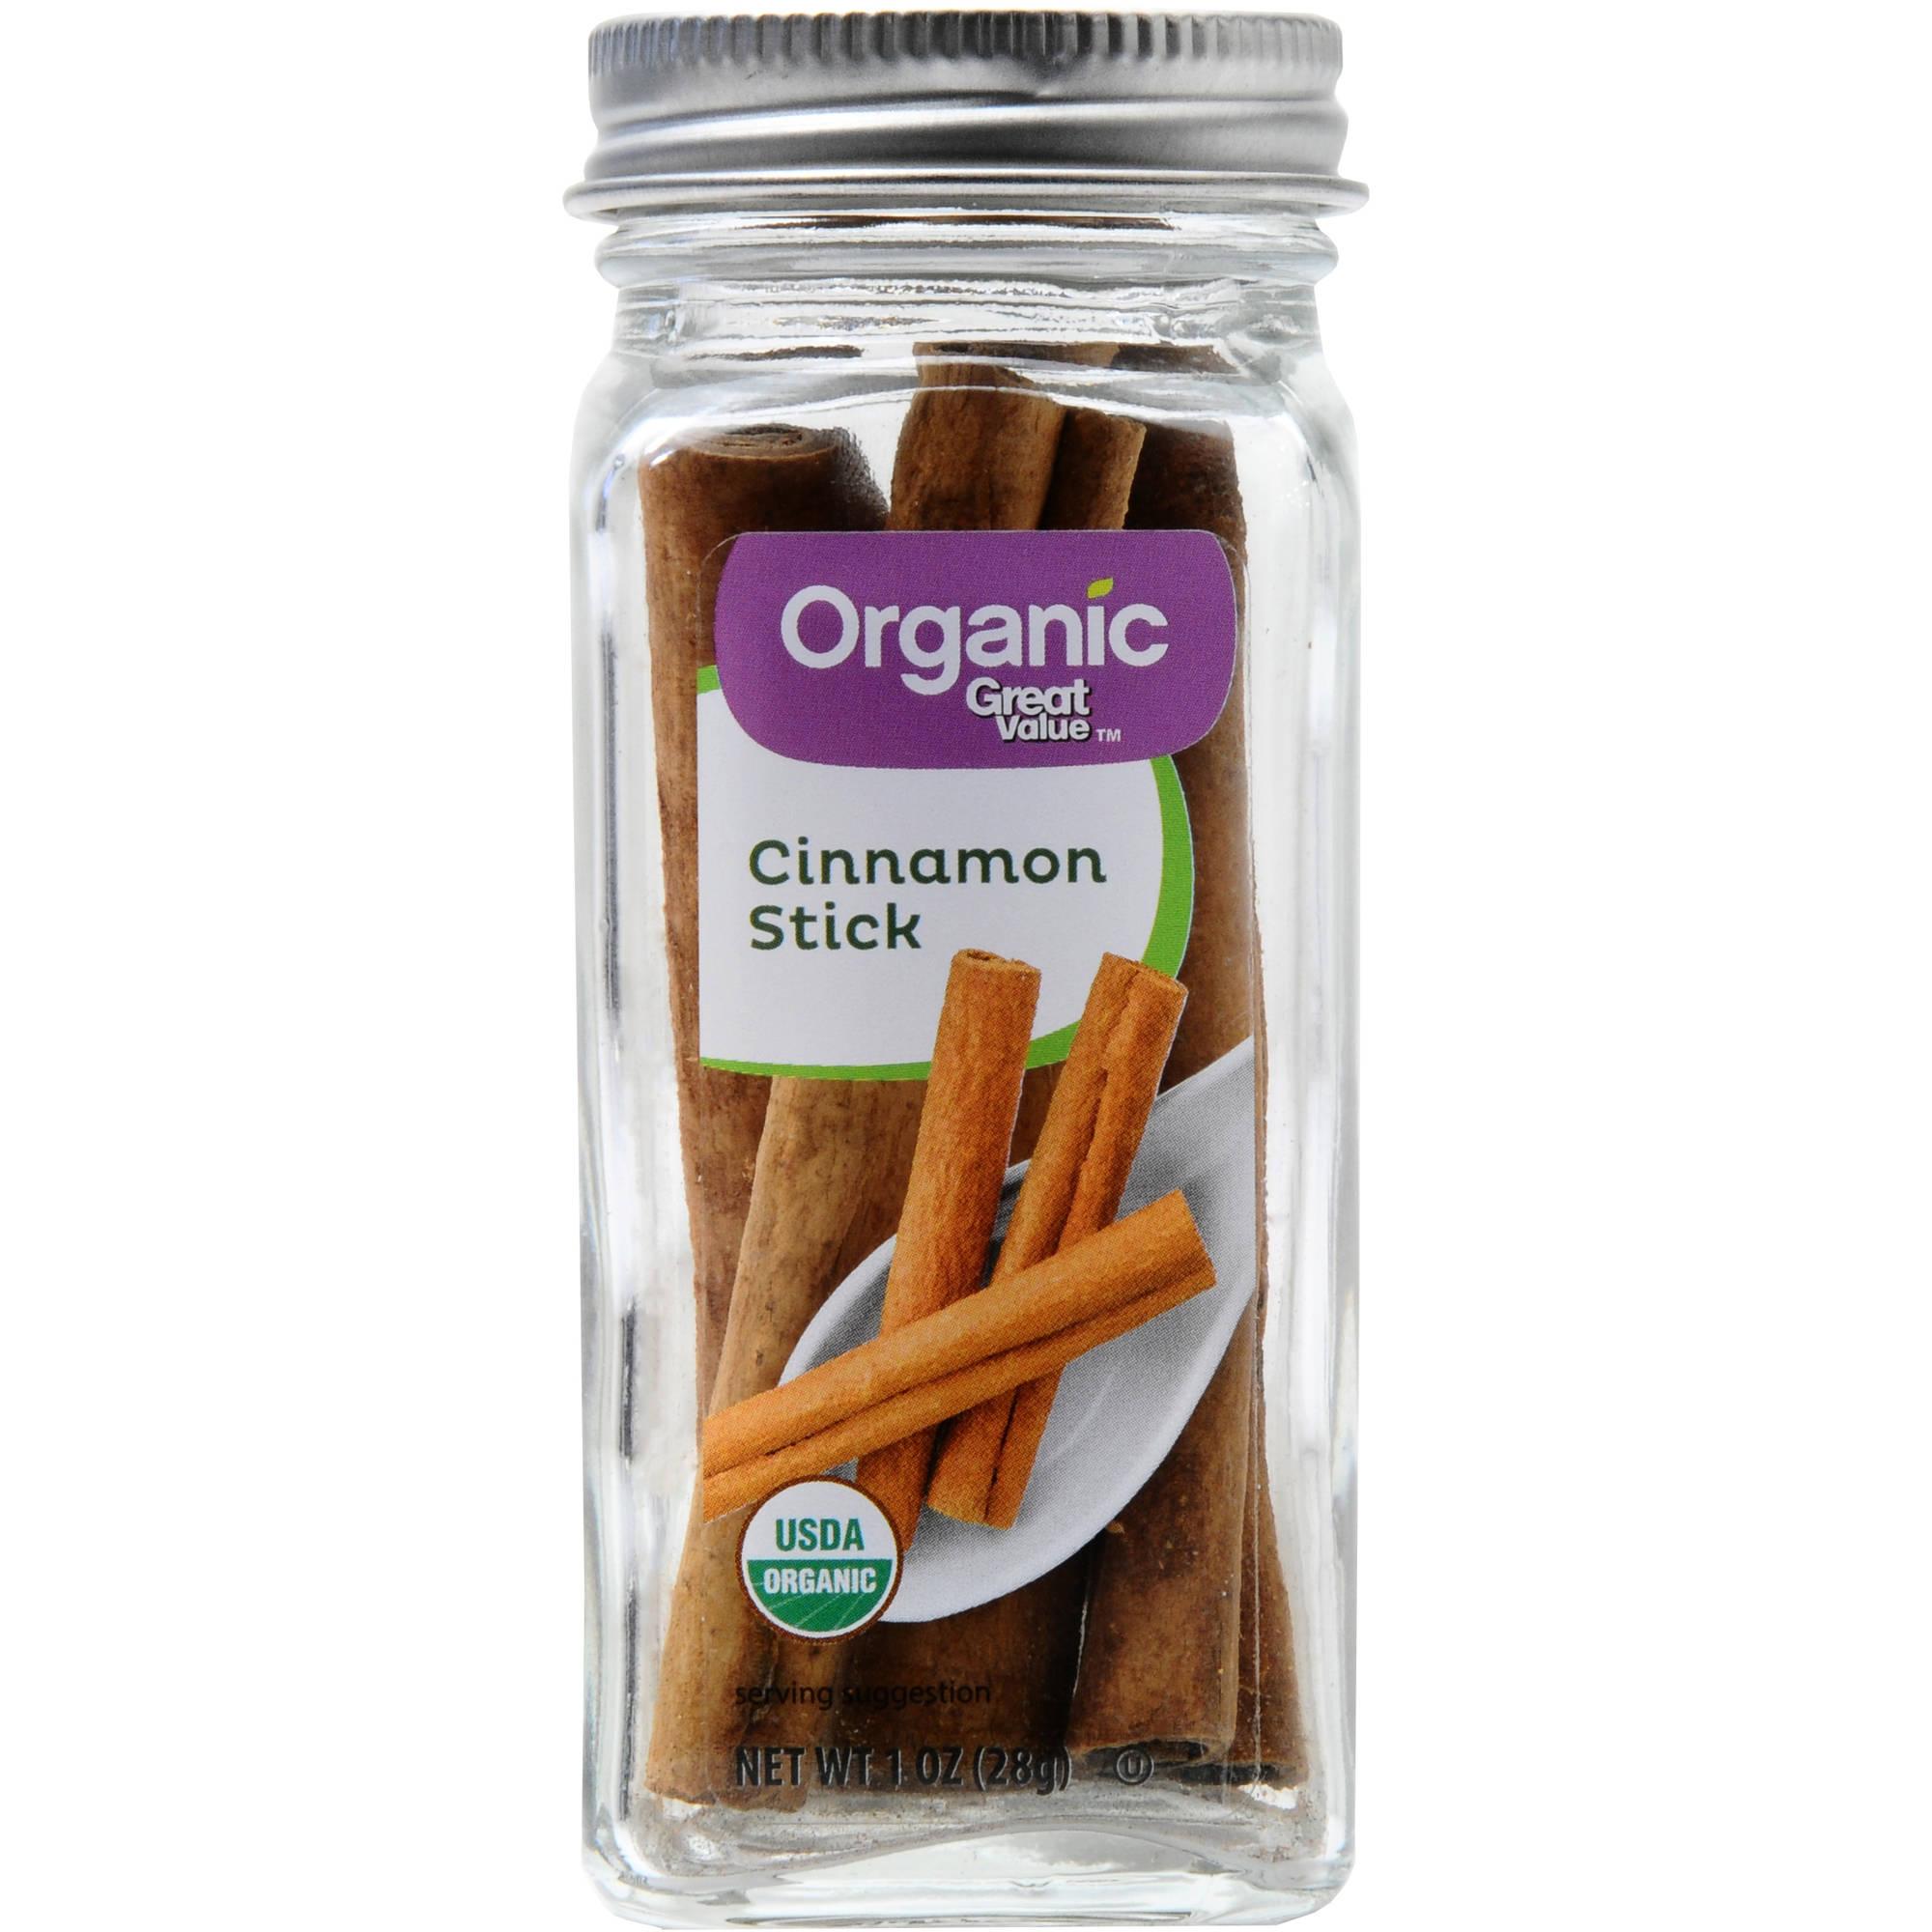 (2 Pack) Great Value Organic Cinnamon Sticks, 1 oz